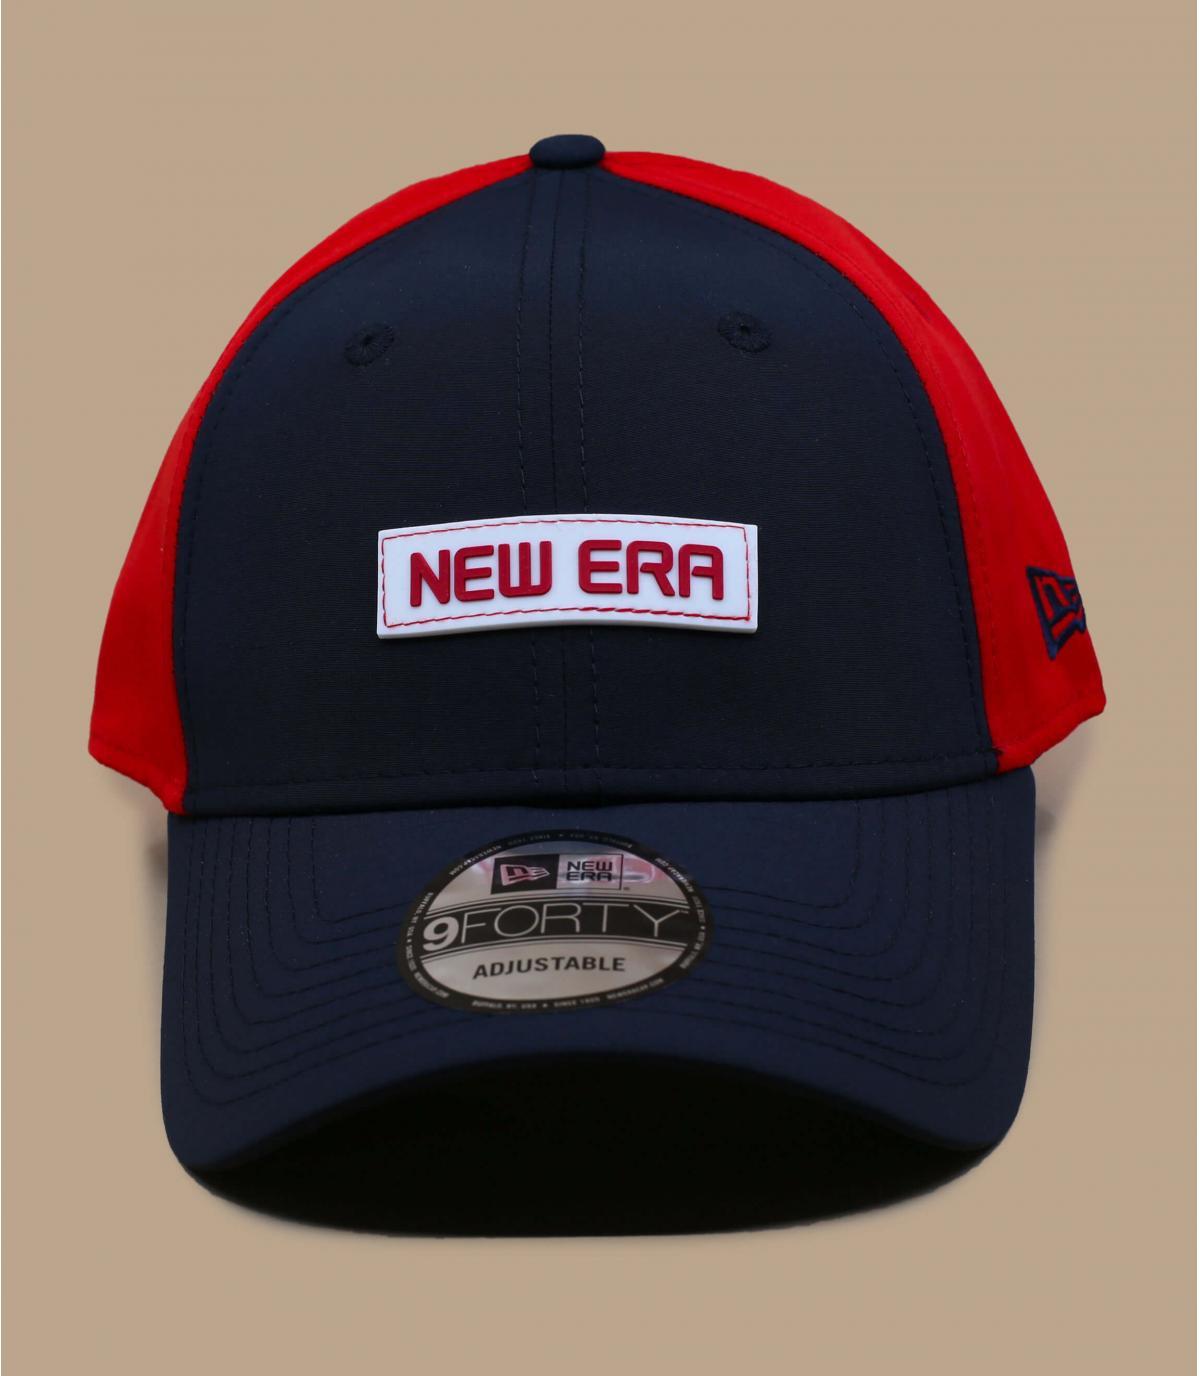 casquette New Era bleu rouge